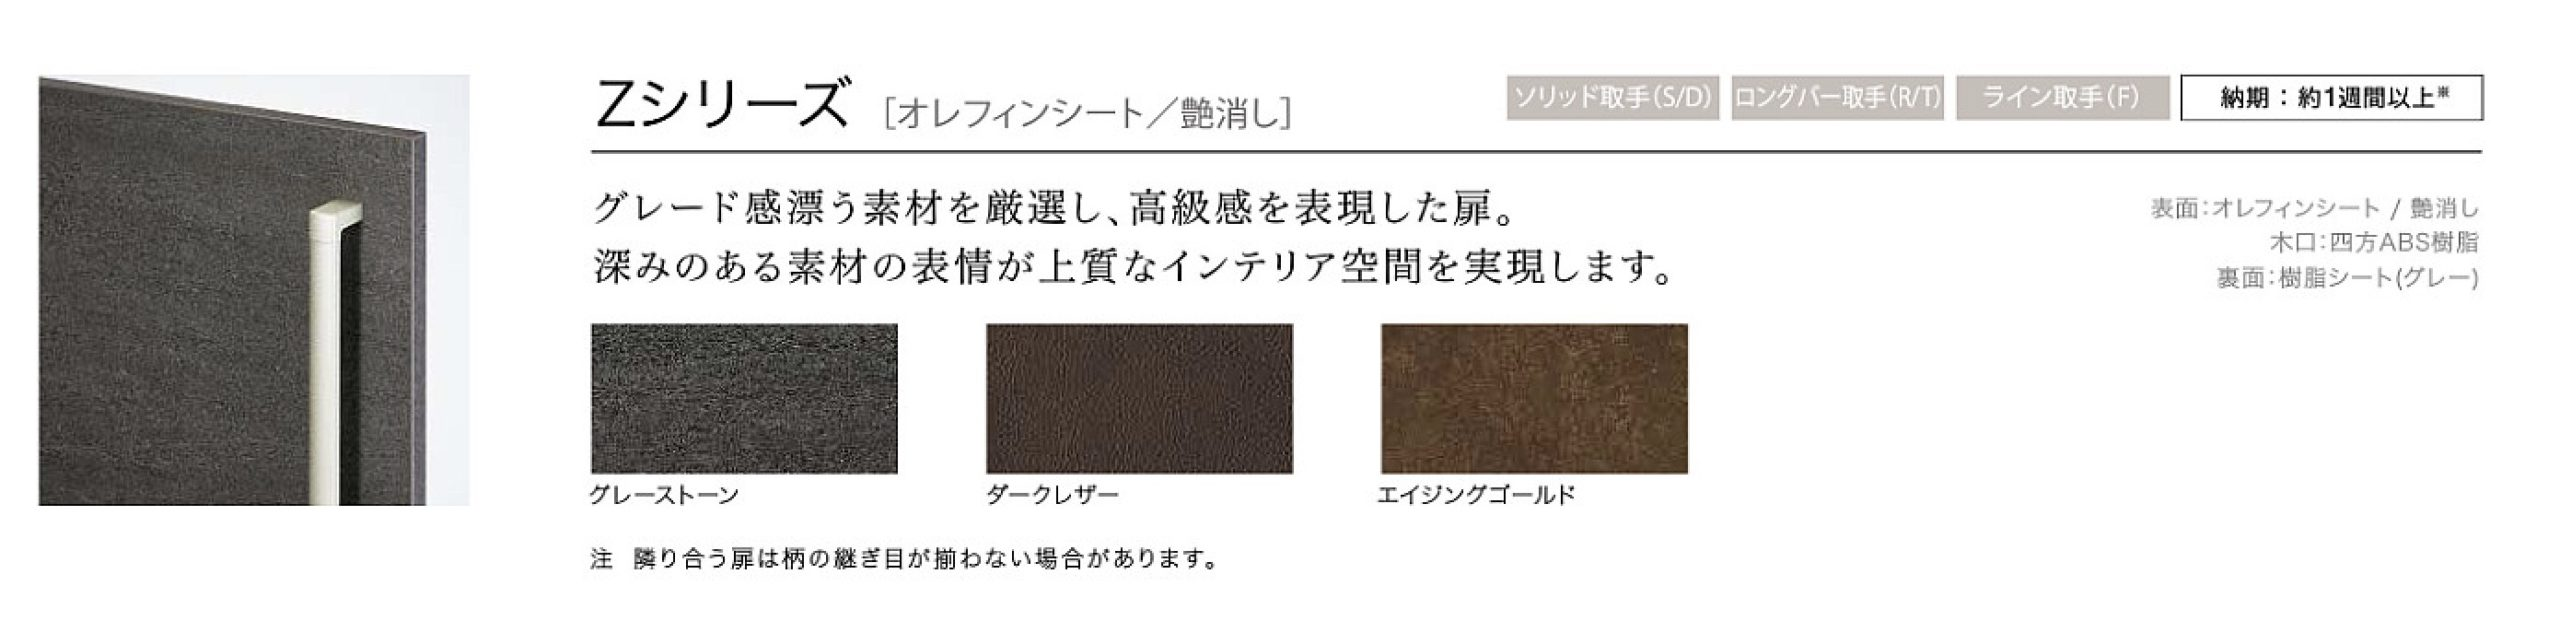 Zシリーズ/グレーストーン・ダークレザー・エイジングゴールド